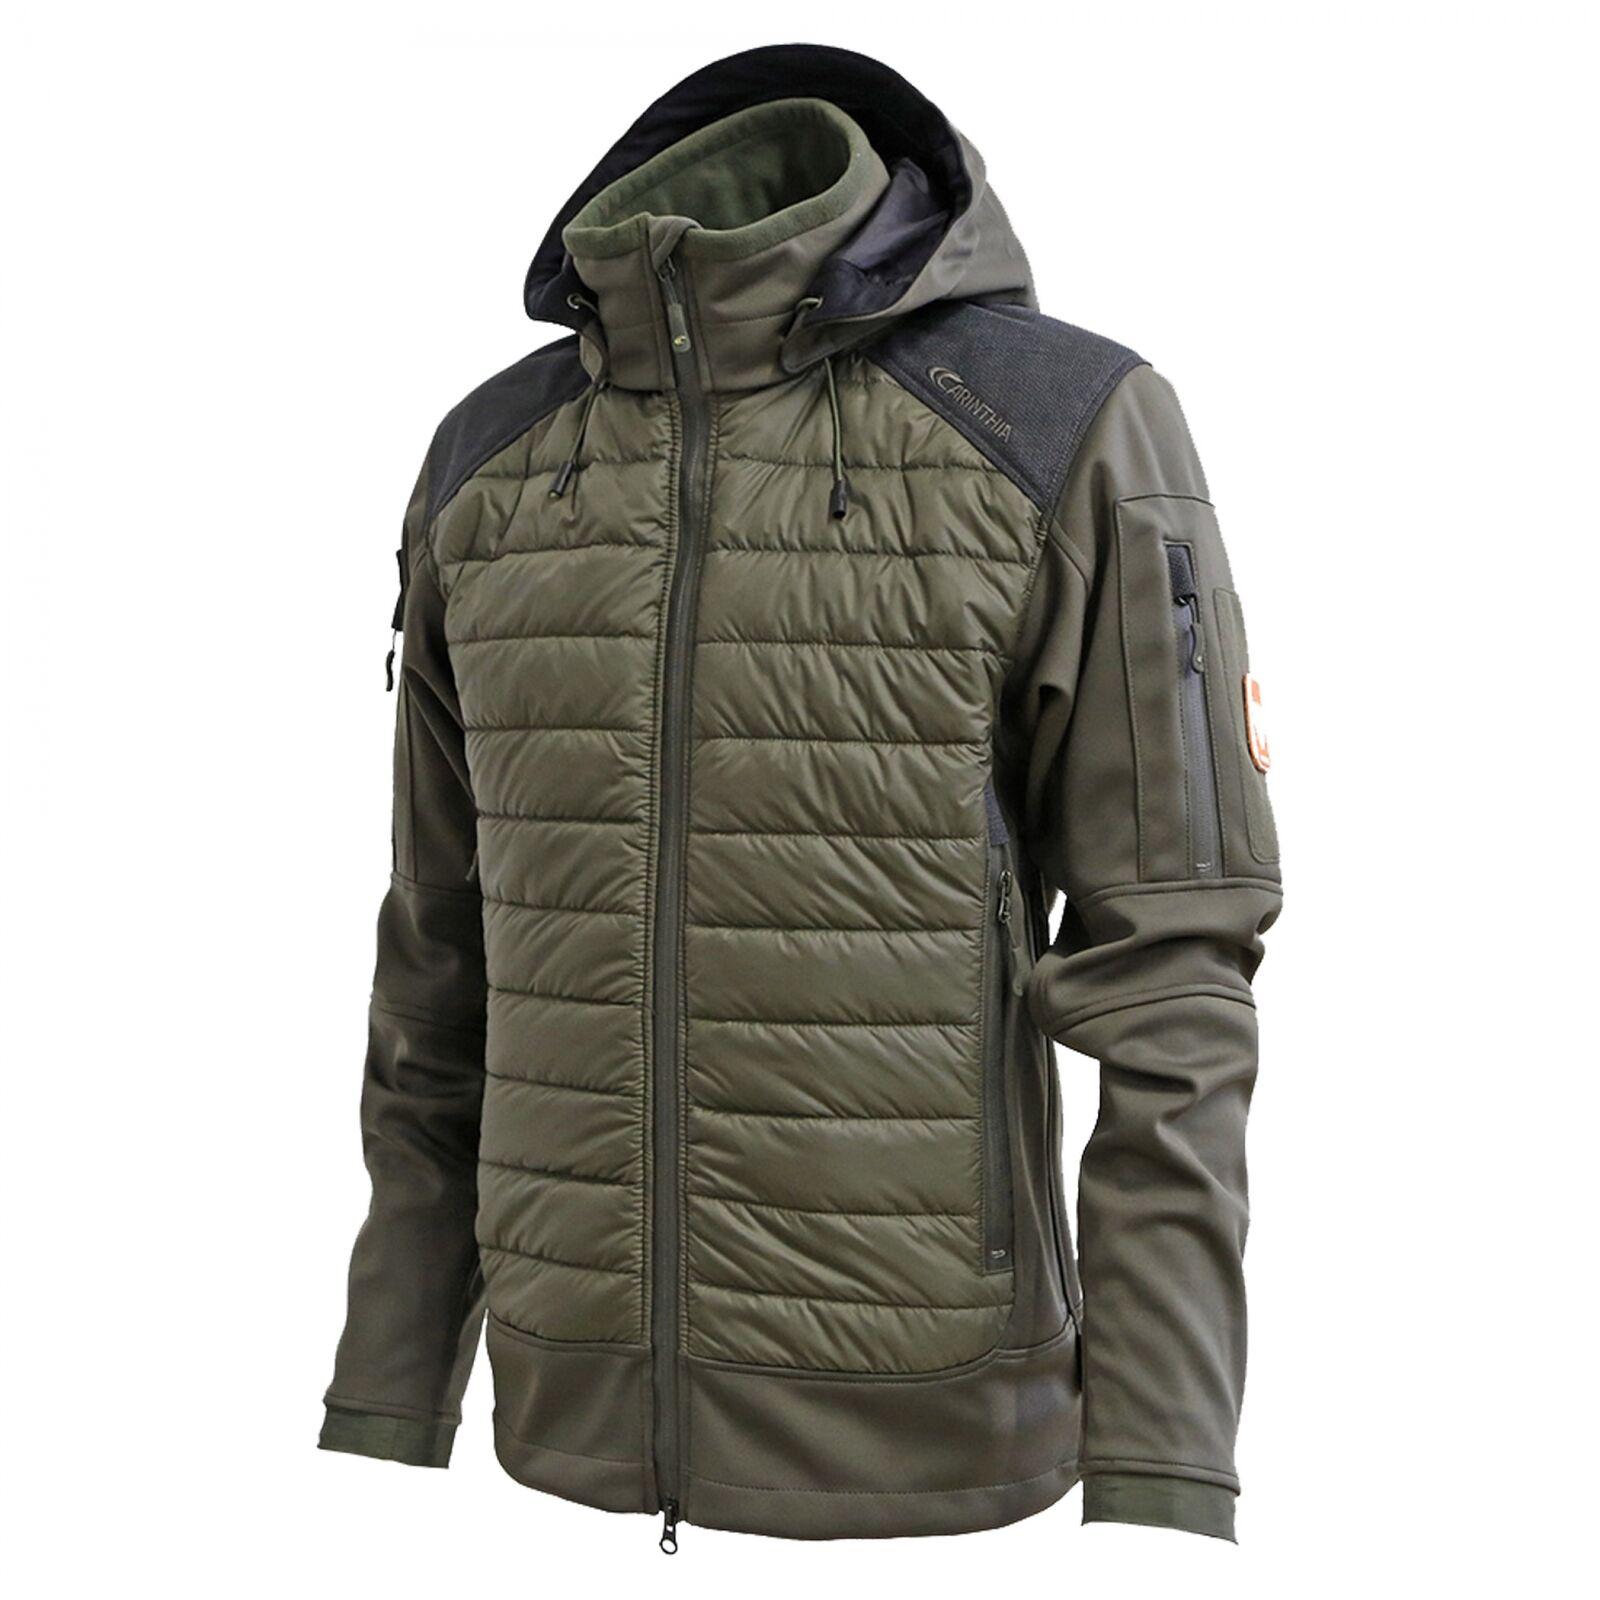 Carinthia G-Loft ISG 2.0 Jacket oliv Neue Version Wärmejacke Softshell G-Loft